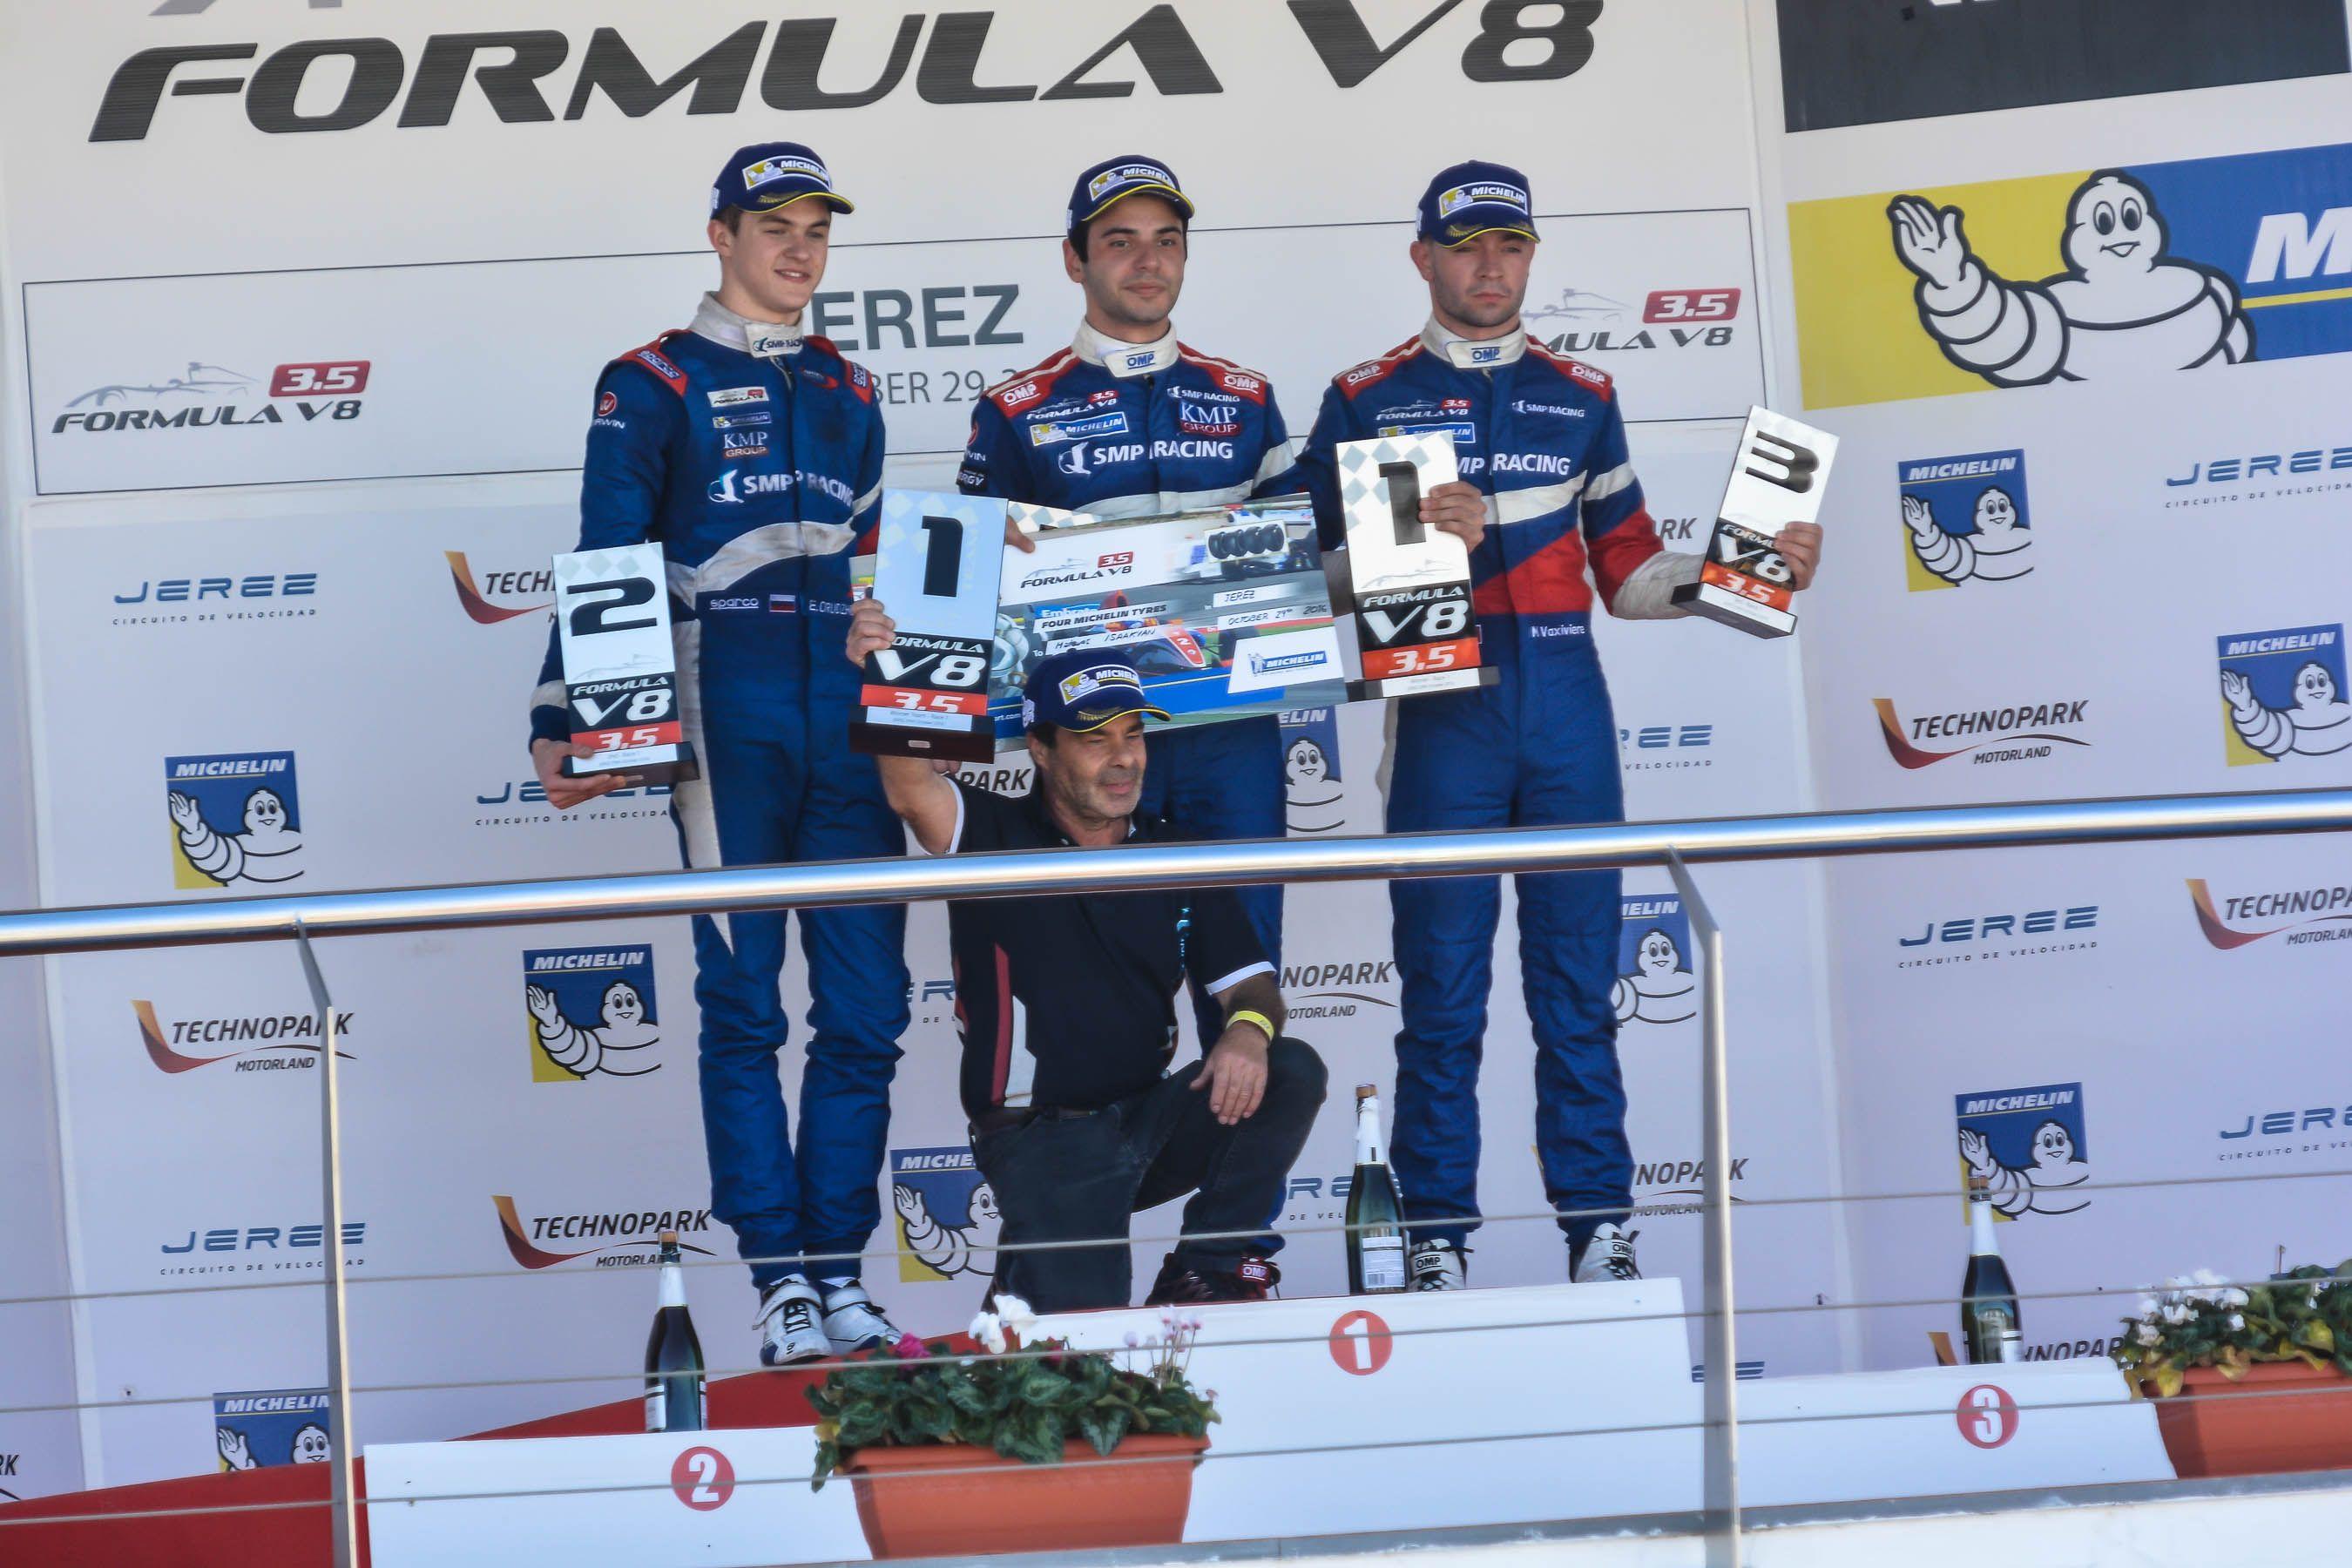 Pódium Fórmula 8: Matevos Isaakyan, Egor Orudzhev y Matthieu Vaxiviere | | Christian Cantizano para MIRA Jerez